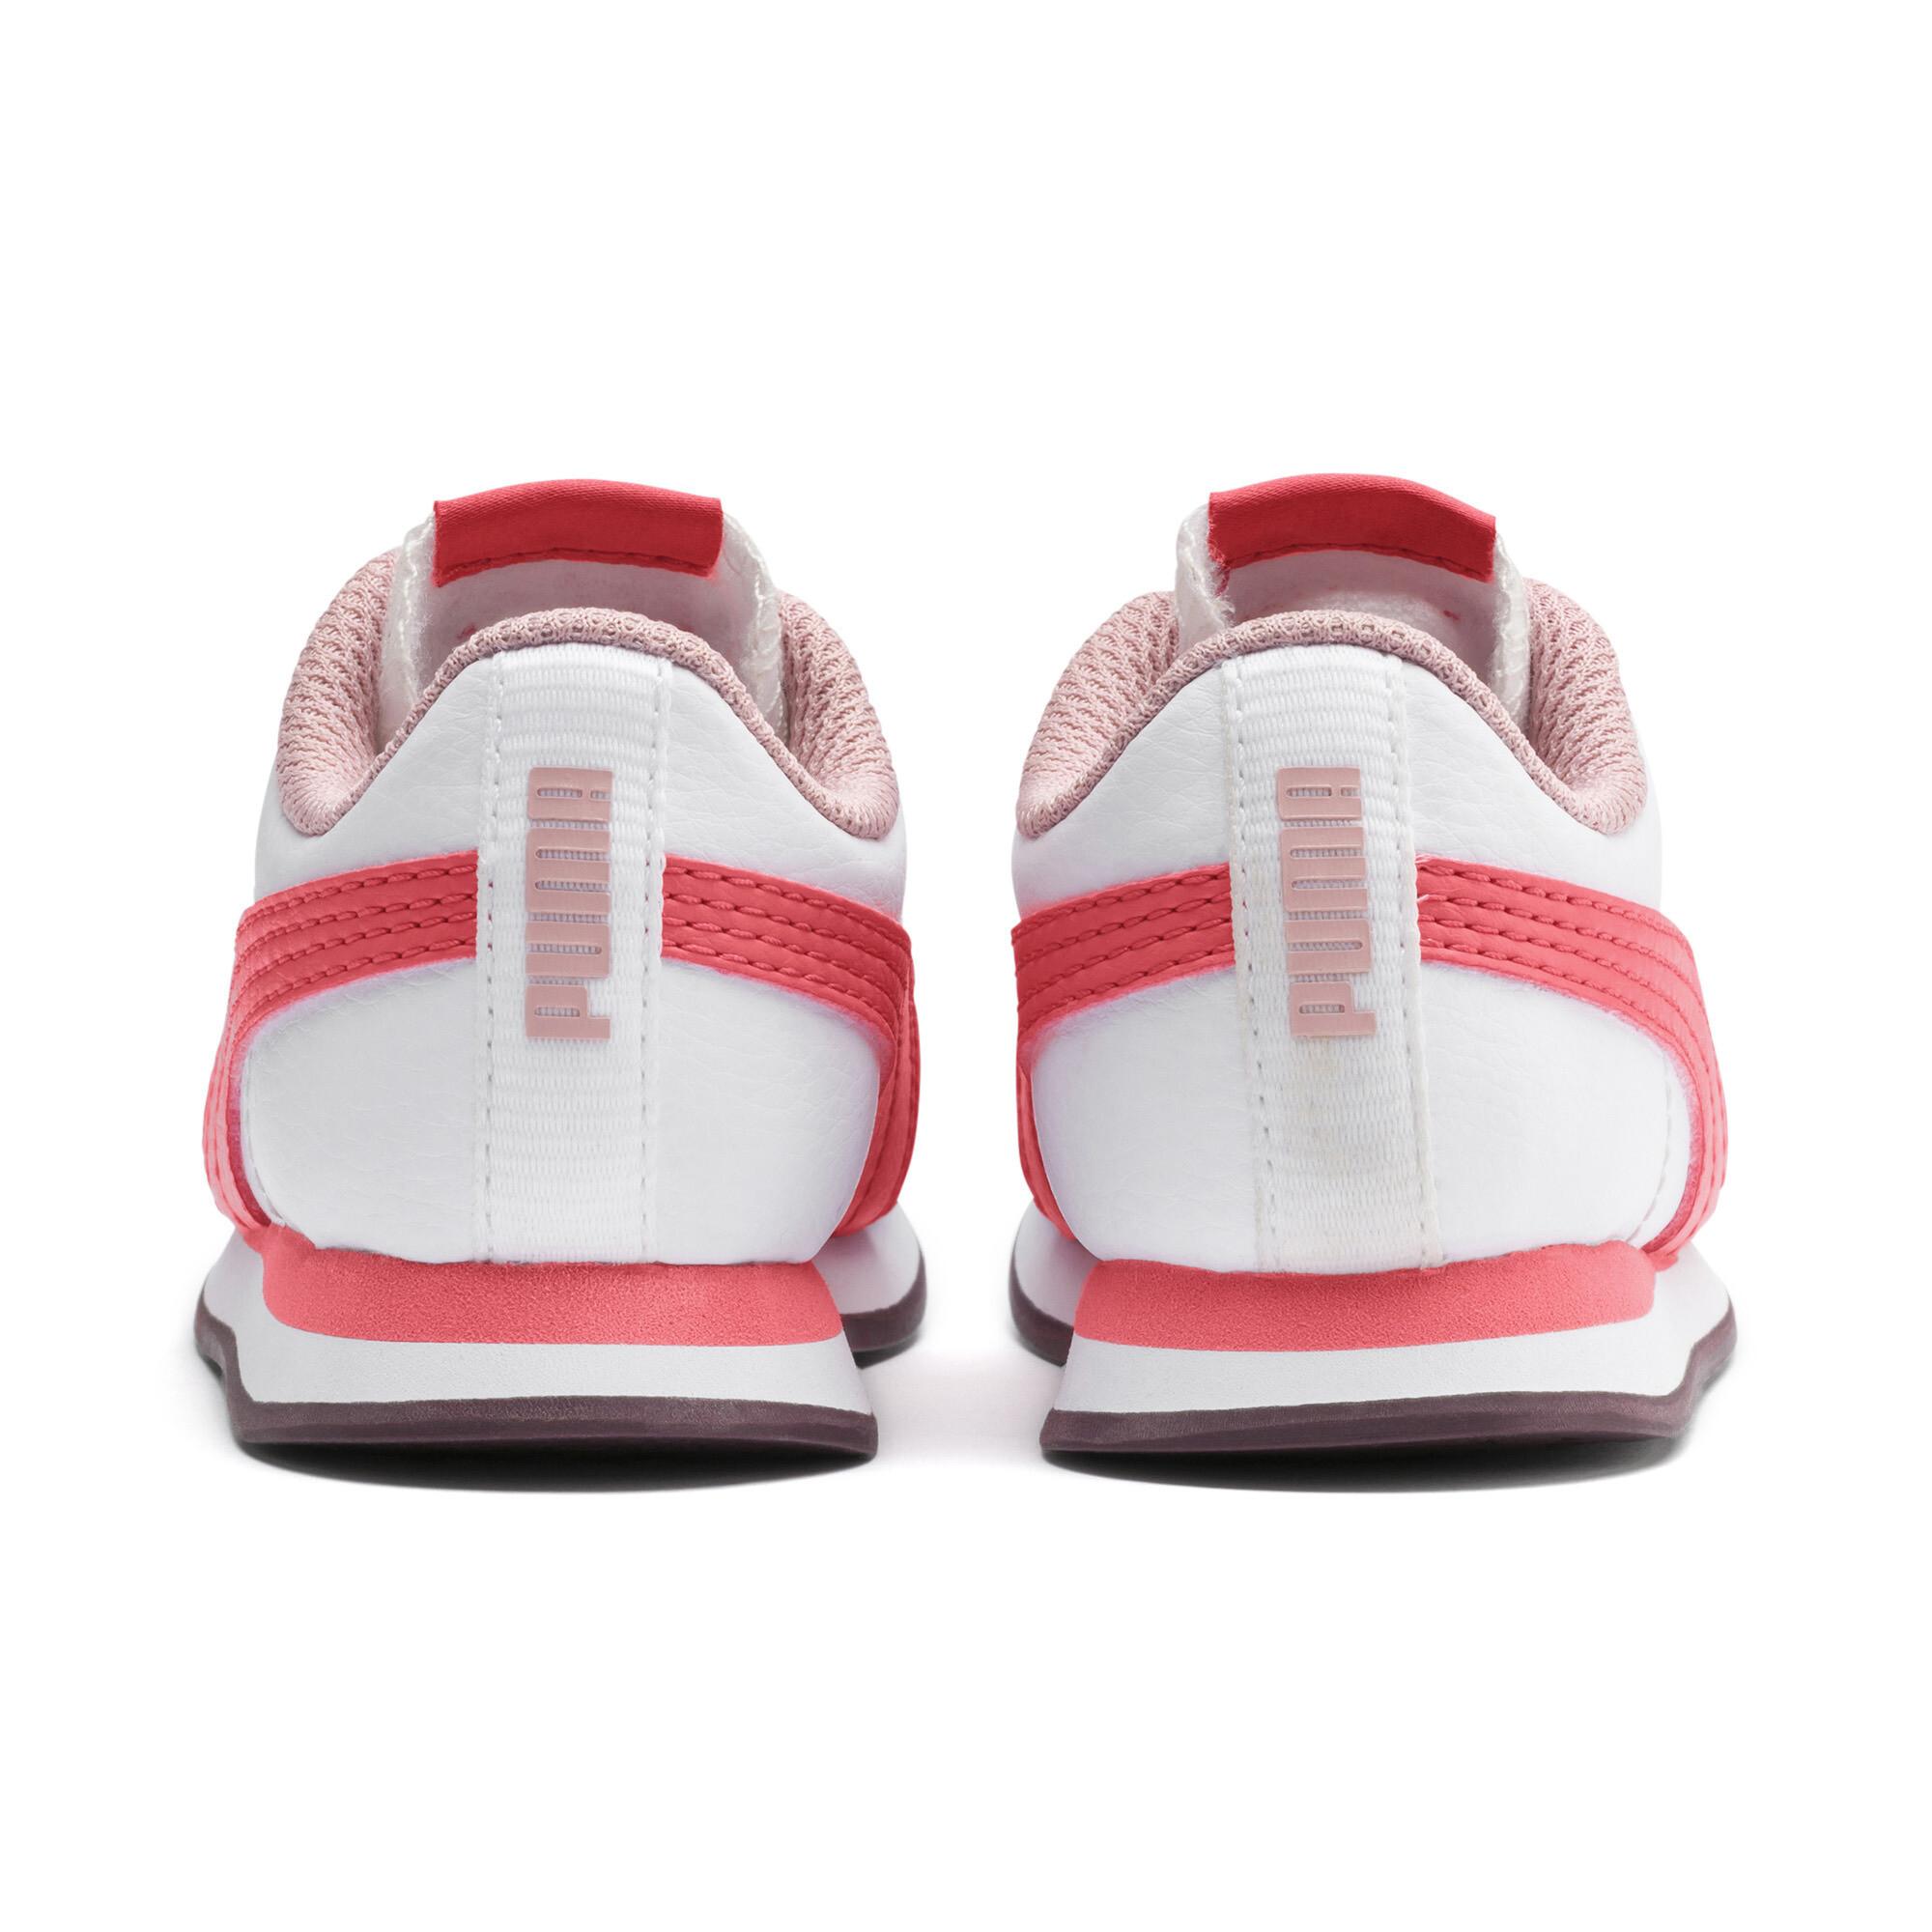 PUMA-Turin-II-AC-Toddler-Shoes-Unisex-Shoe-Kids thumbnail 13